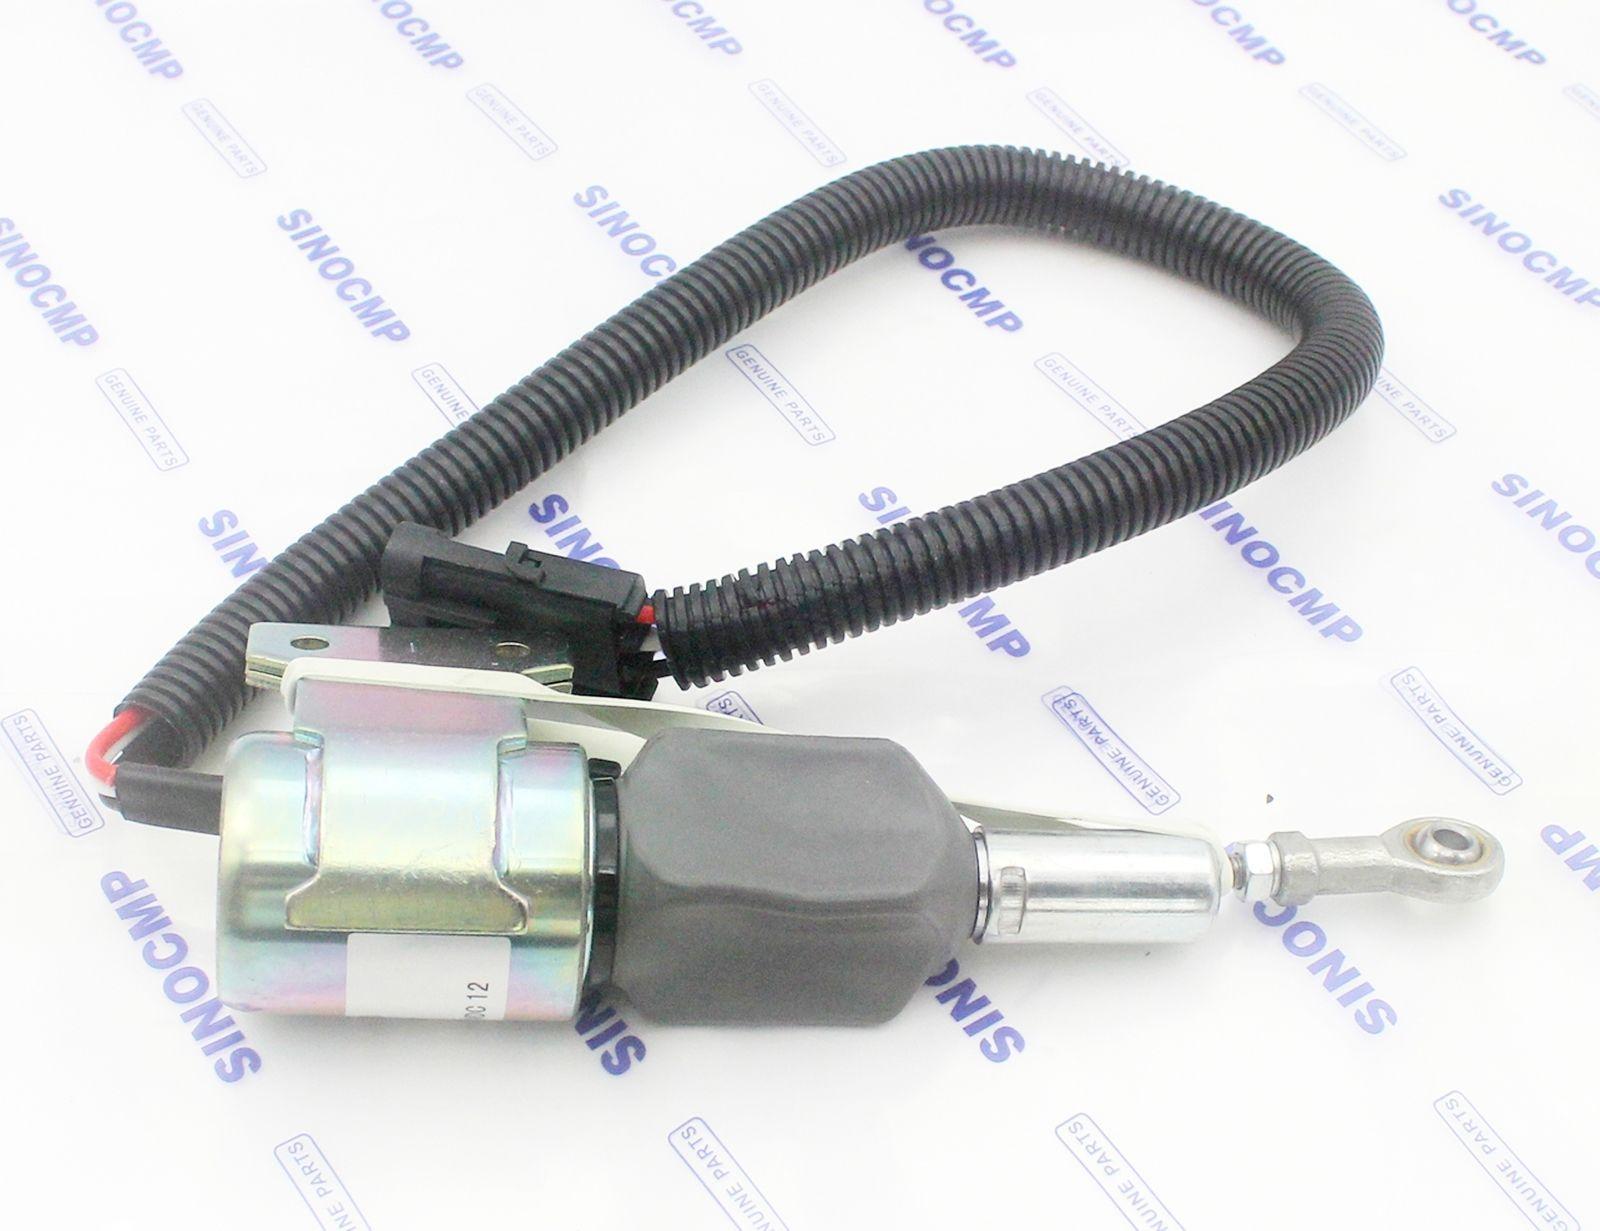 Gl1200 Ignition Switch Wiring Diagram